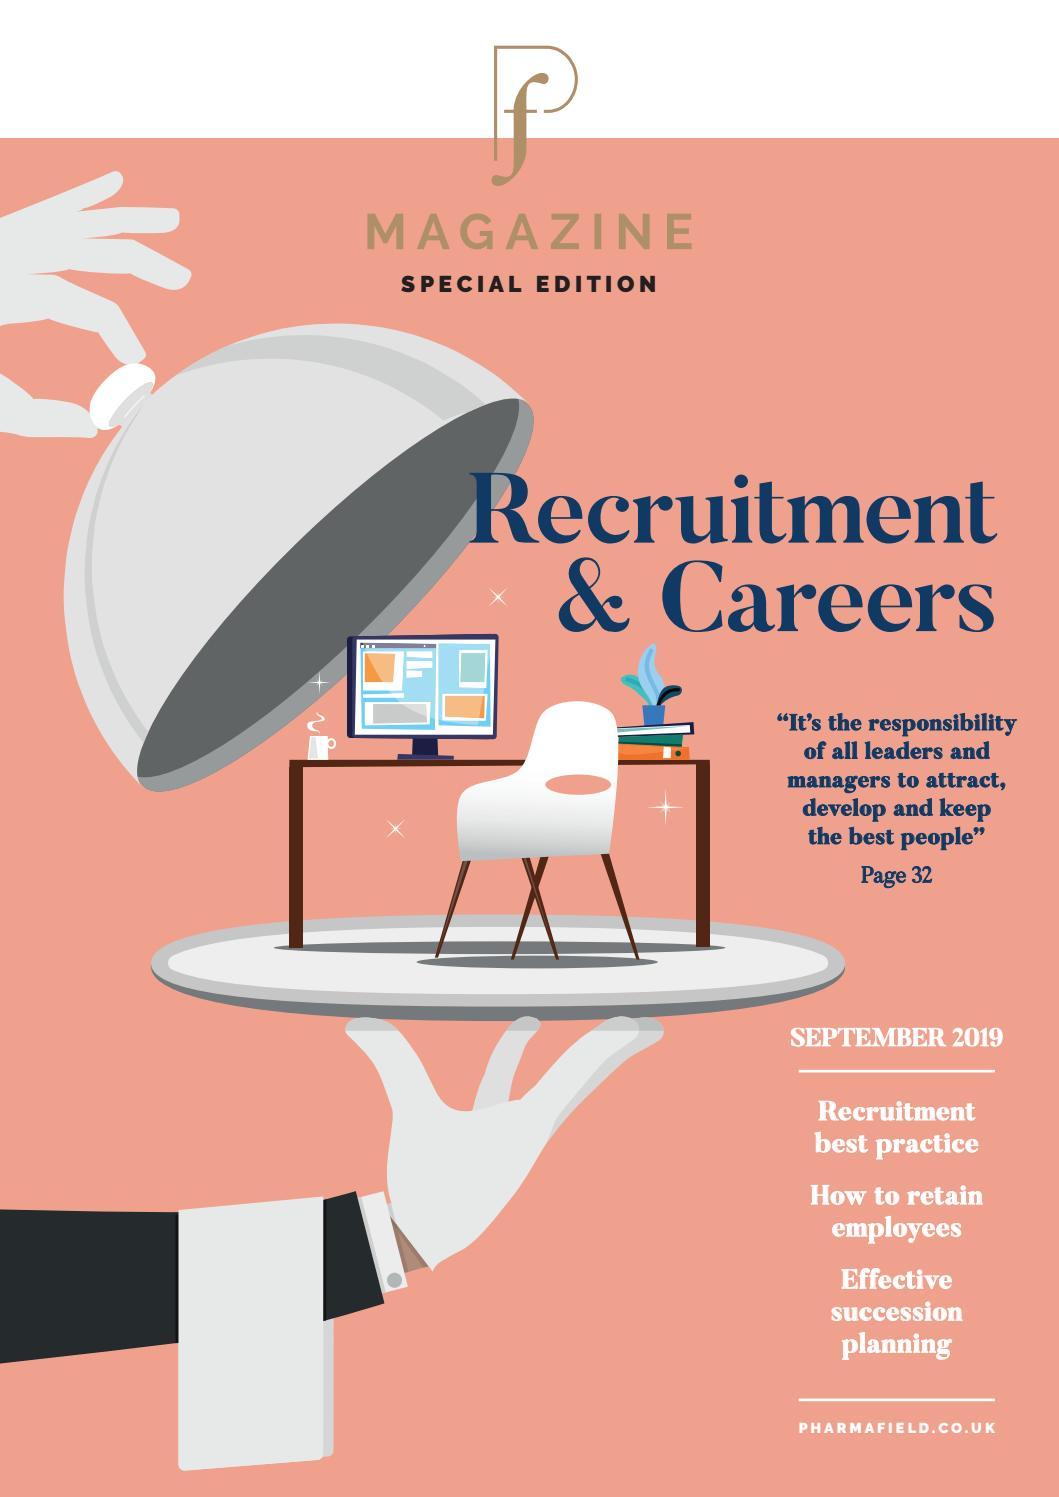 Pf Magazine September 2019 by Pf Magazine - issuu